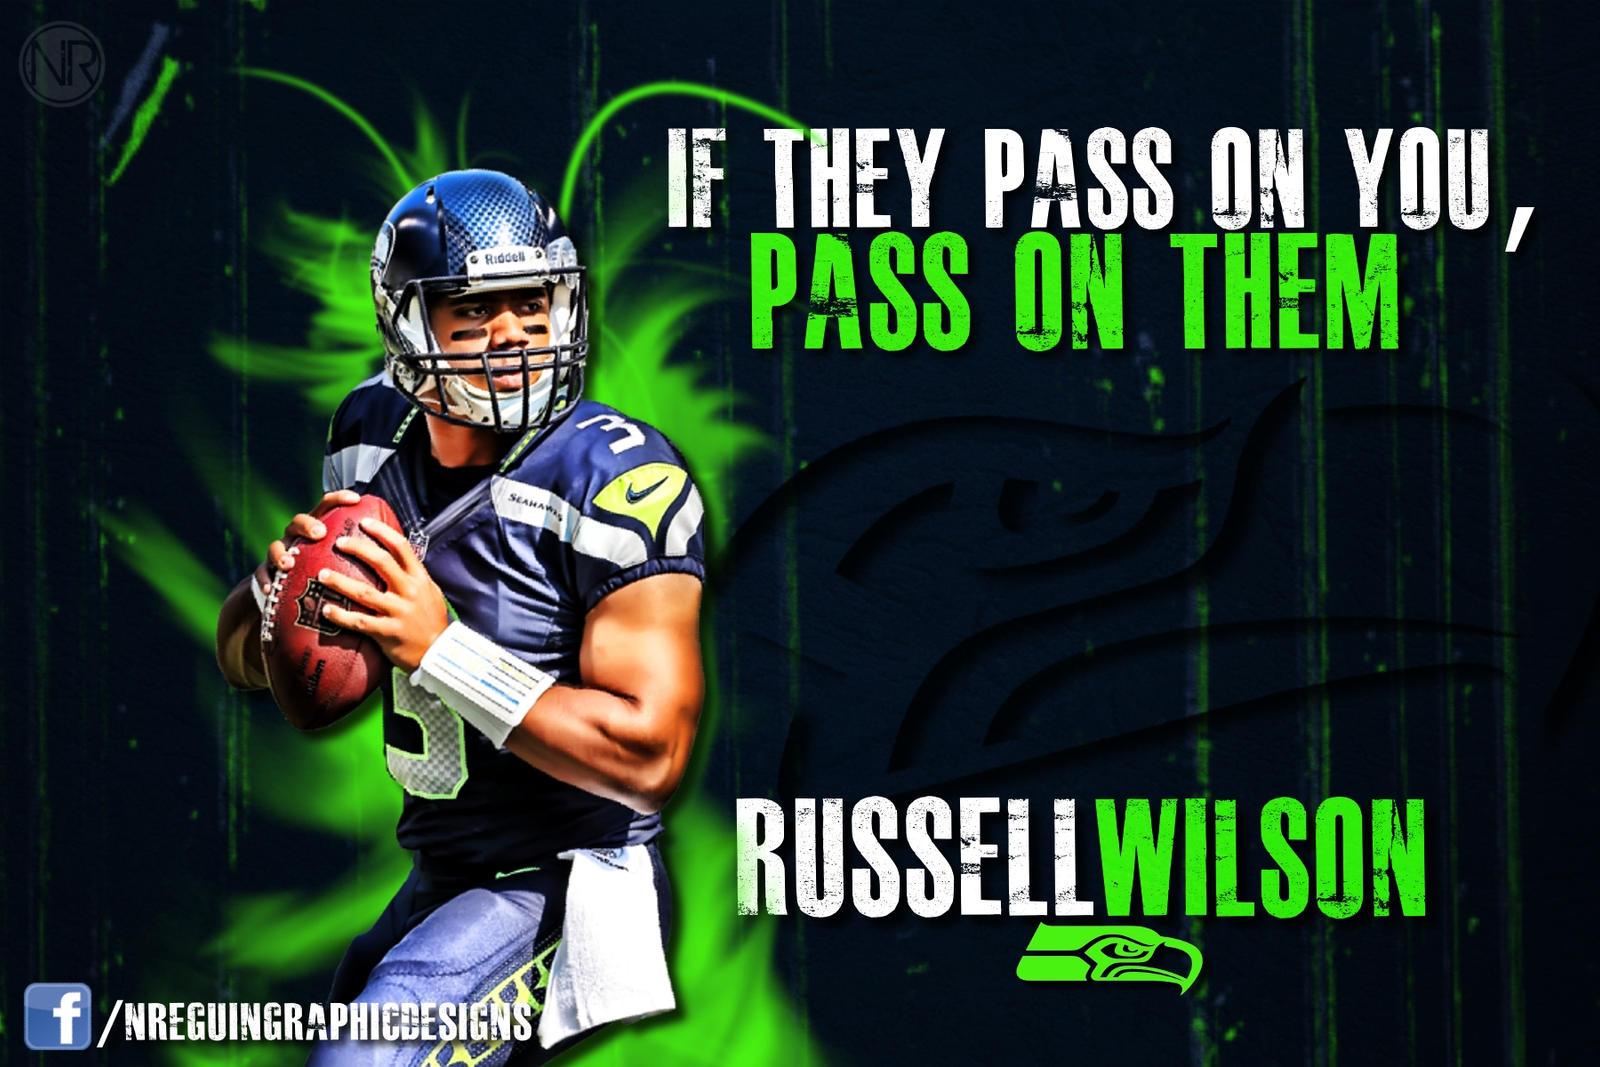 Hd russell wilson green 39 pass on them 39 wallpaper by nreguingraphicdesign on deviantart - Seahawks wallpaper russell wilson ...